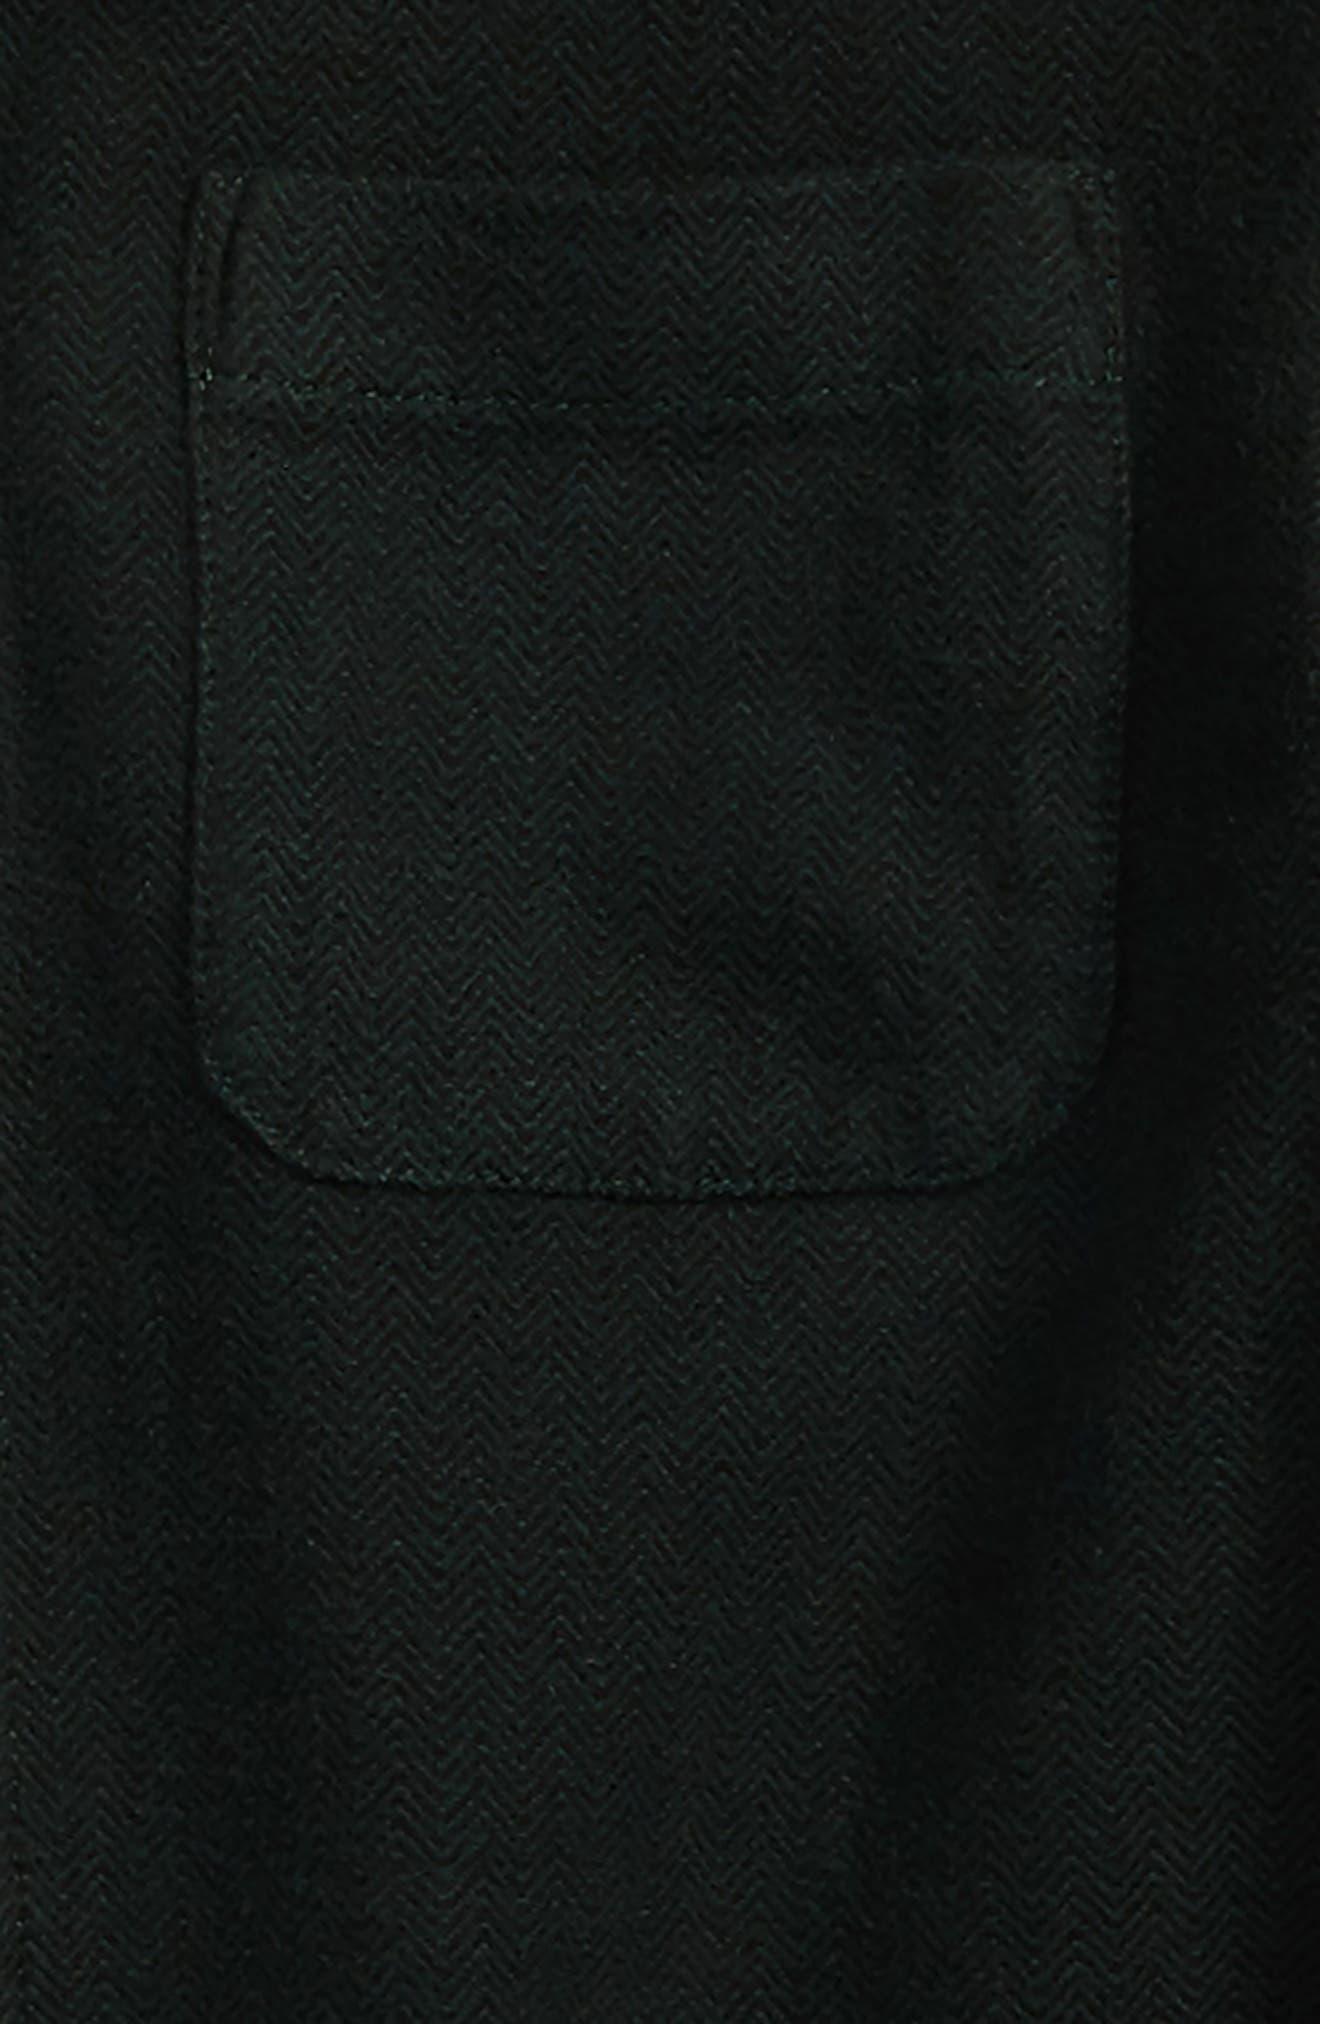 Herringbone Hooded Shirt,                             Alternate thumbnail 2, color,                             301